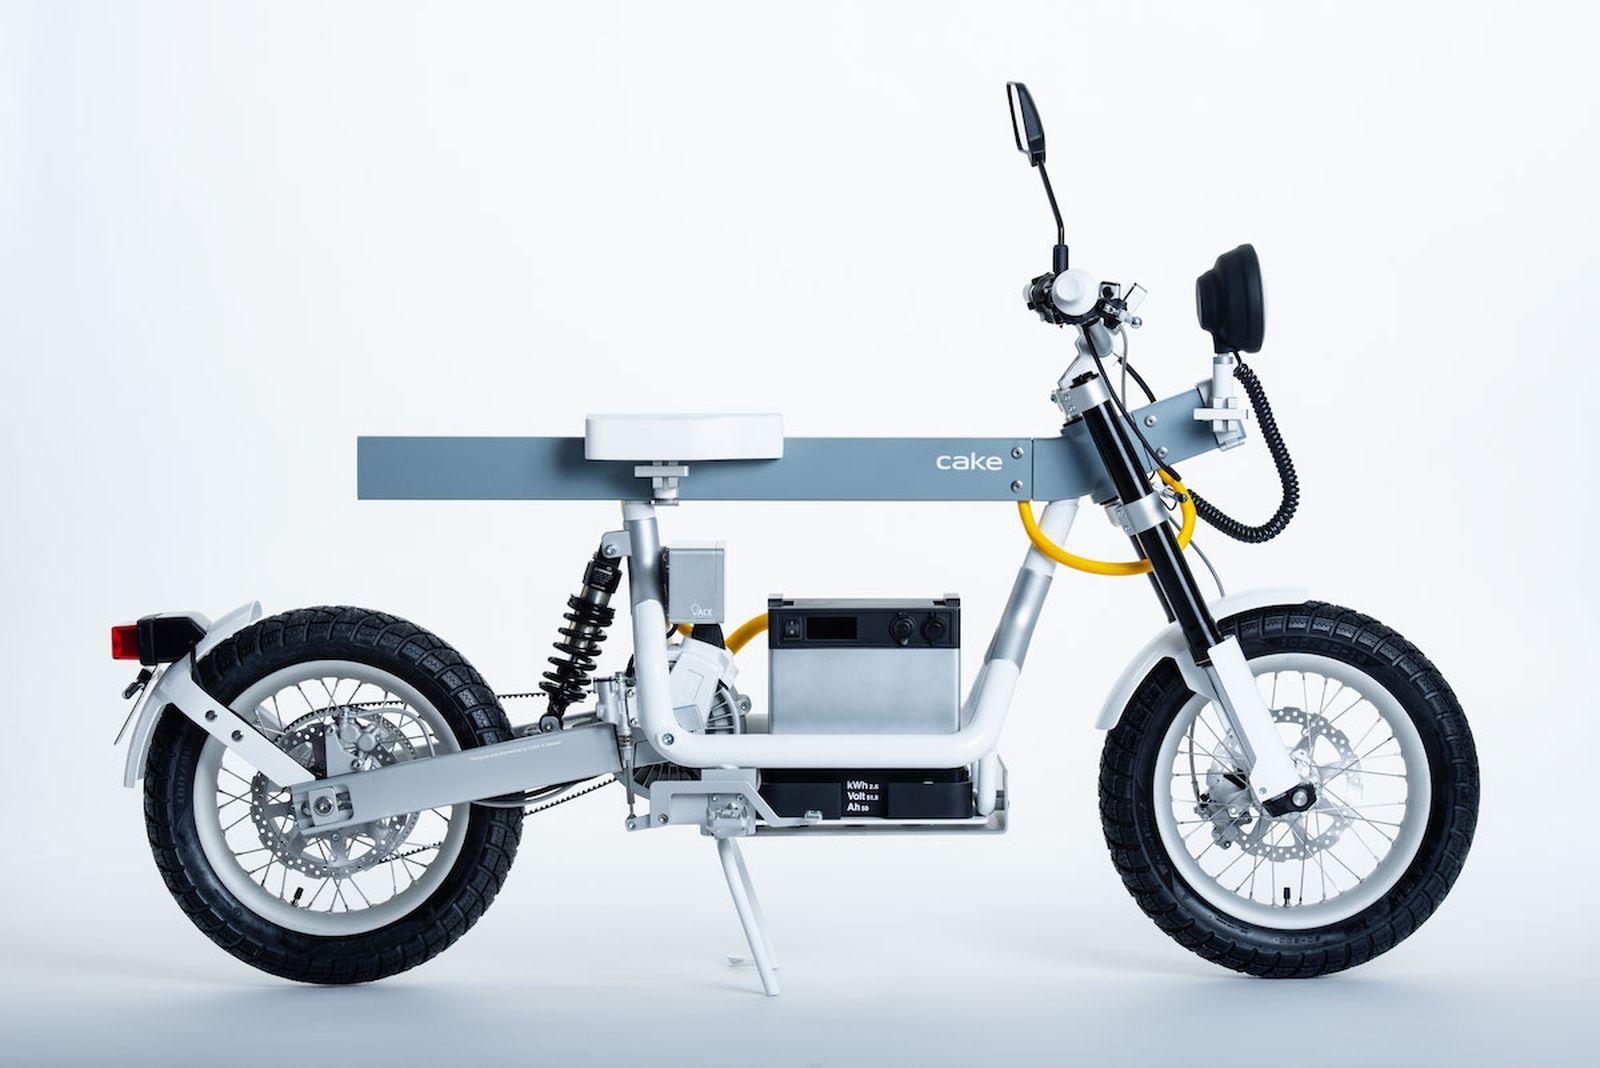 CAKE Ösa Modular Electric Motorcyle